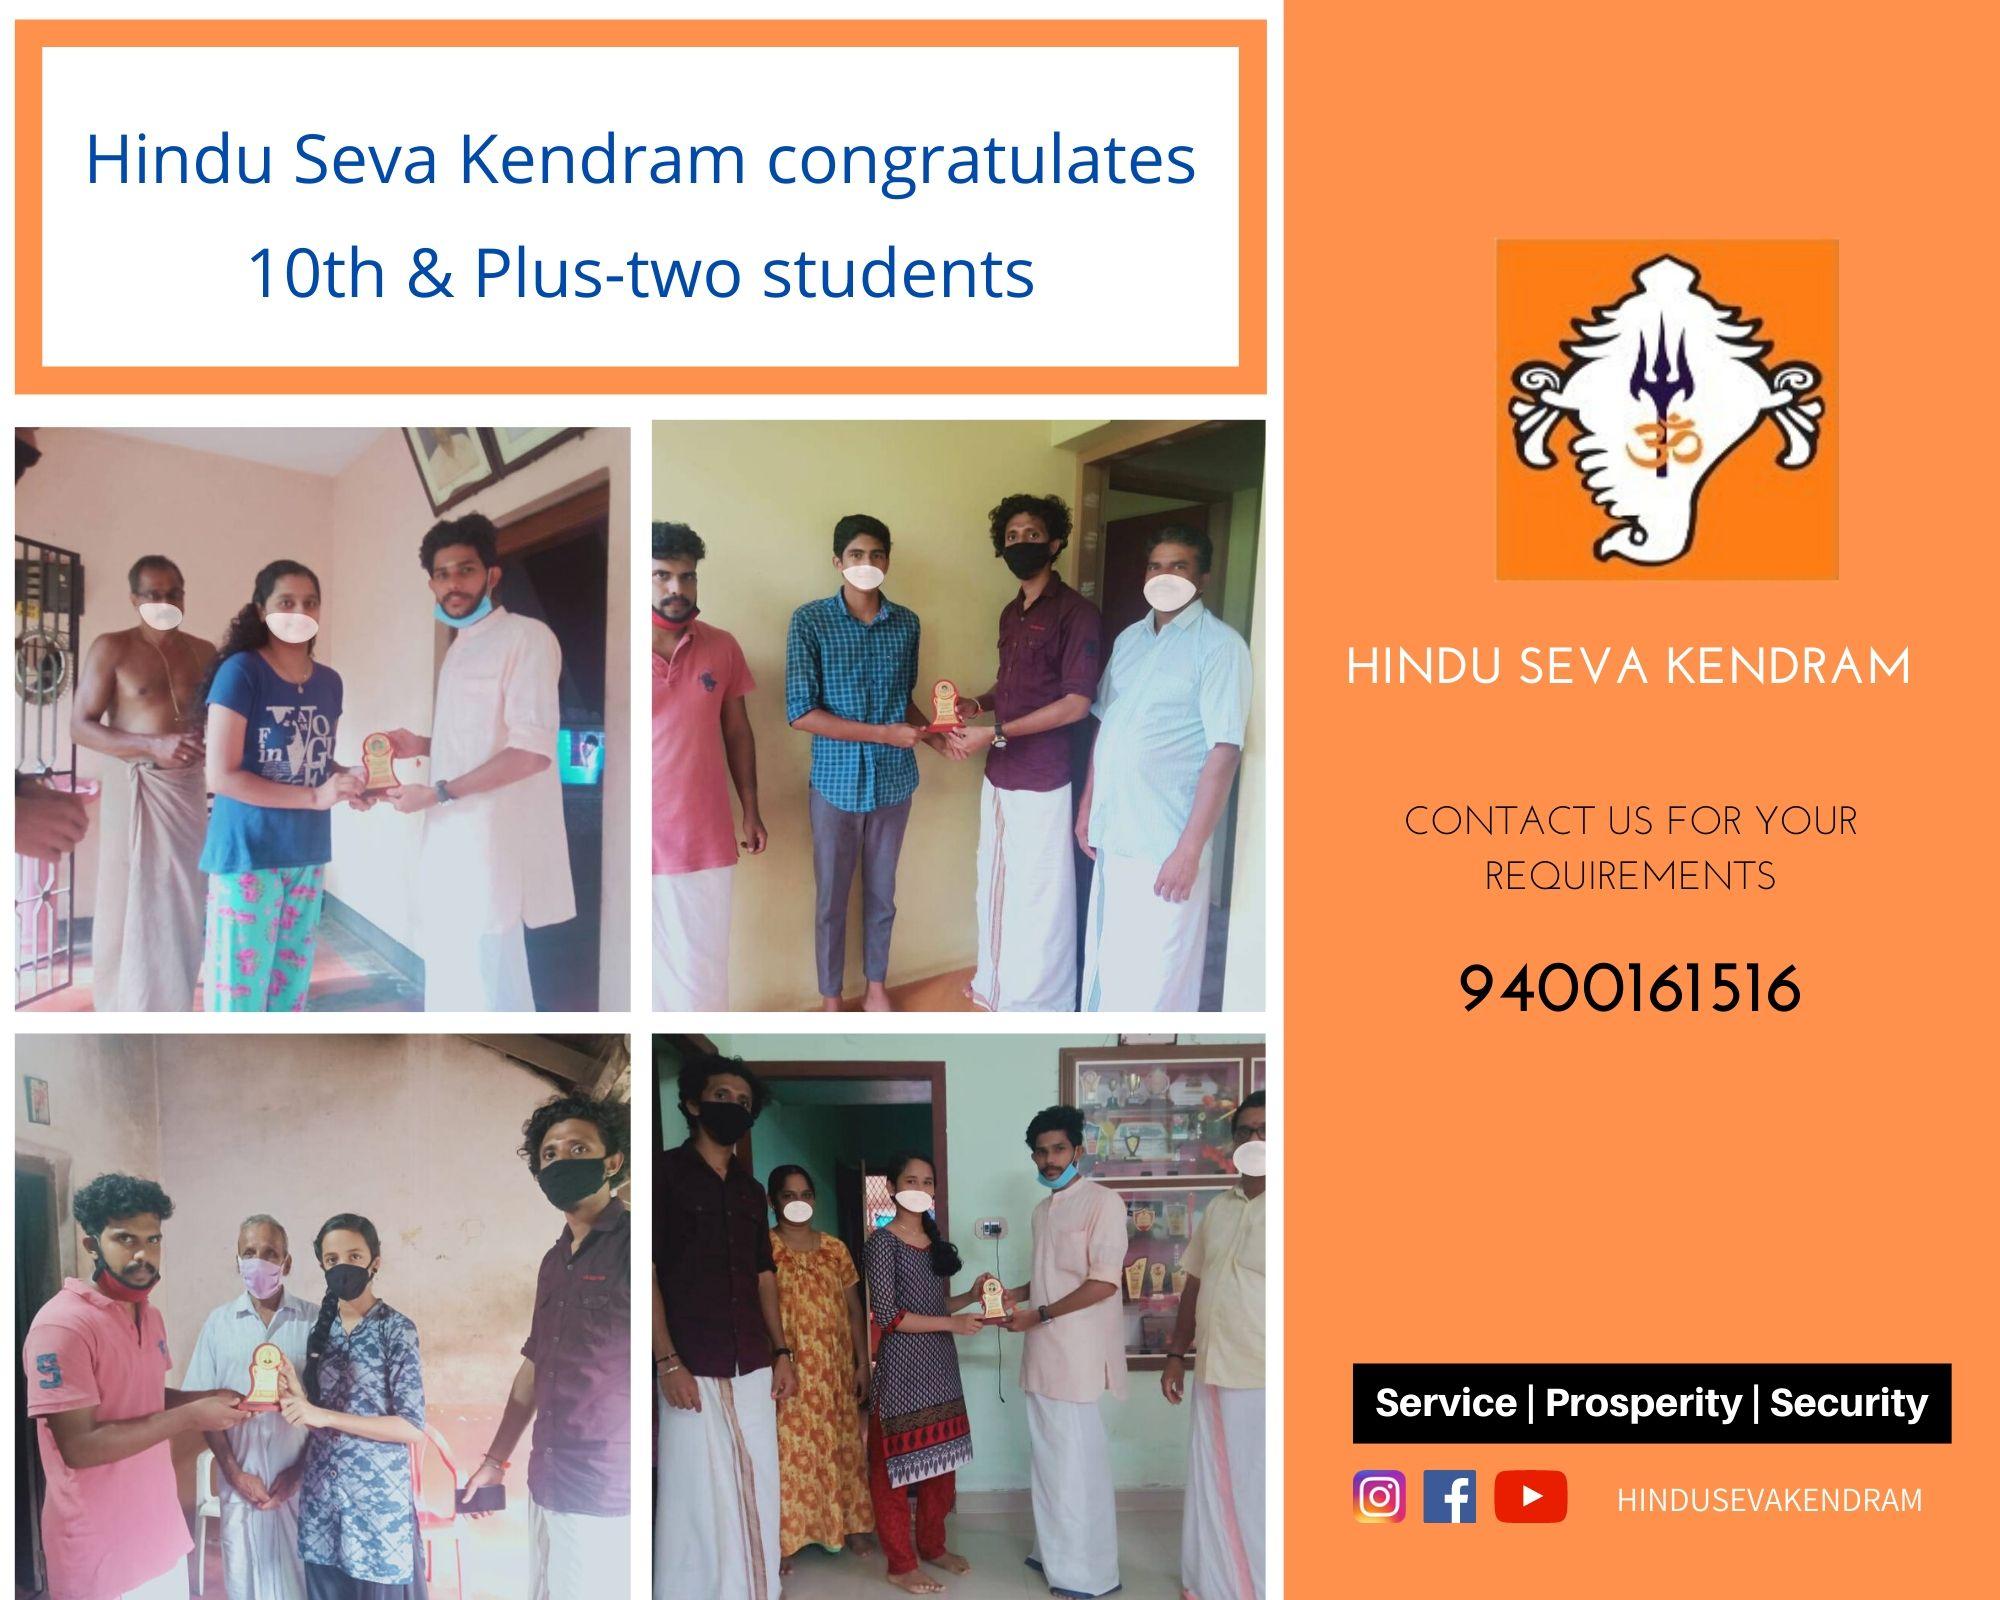 Hindu Seva Kendram congratulates tenth & plus-two students